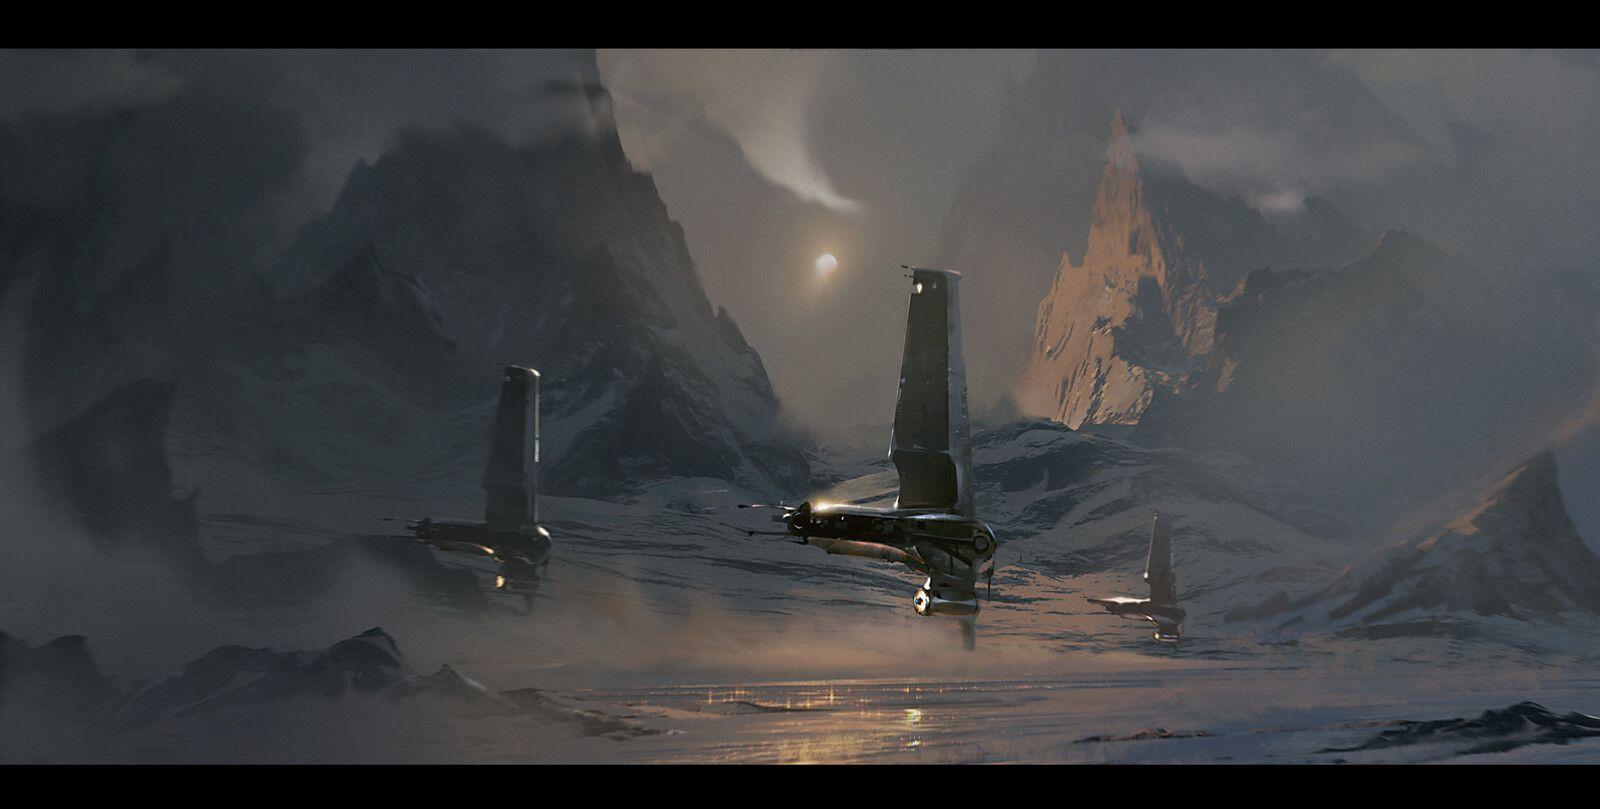 Tactical group., Konstantin Radchikov on ArtStation at